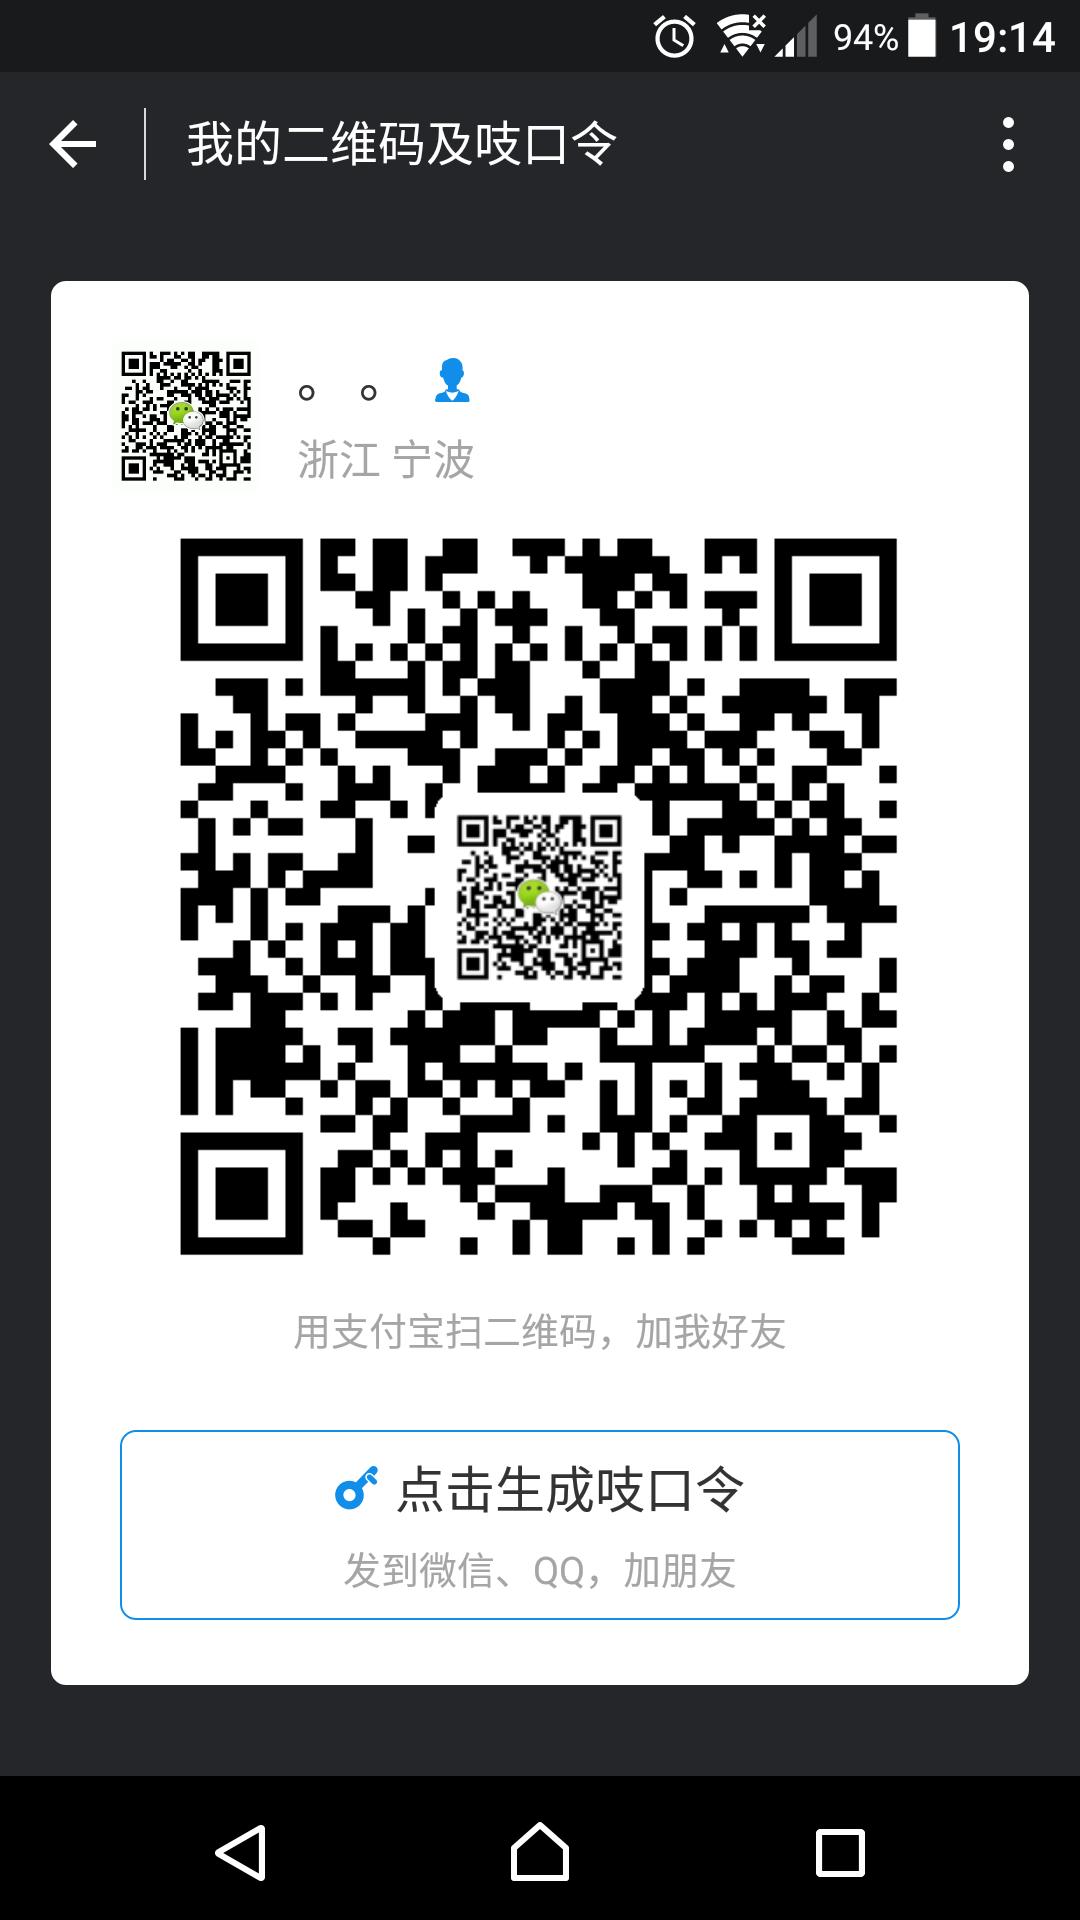 Screenshot_20170910-191458.png